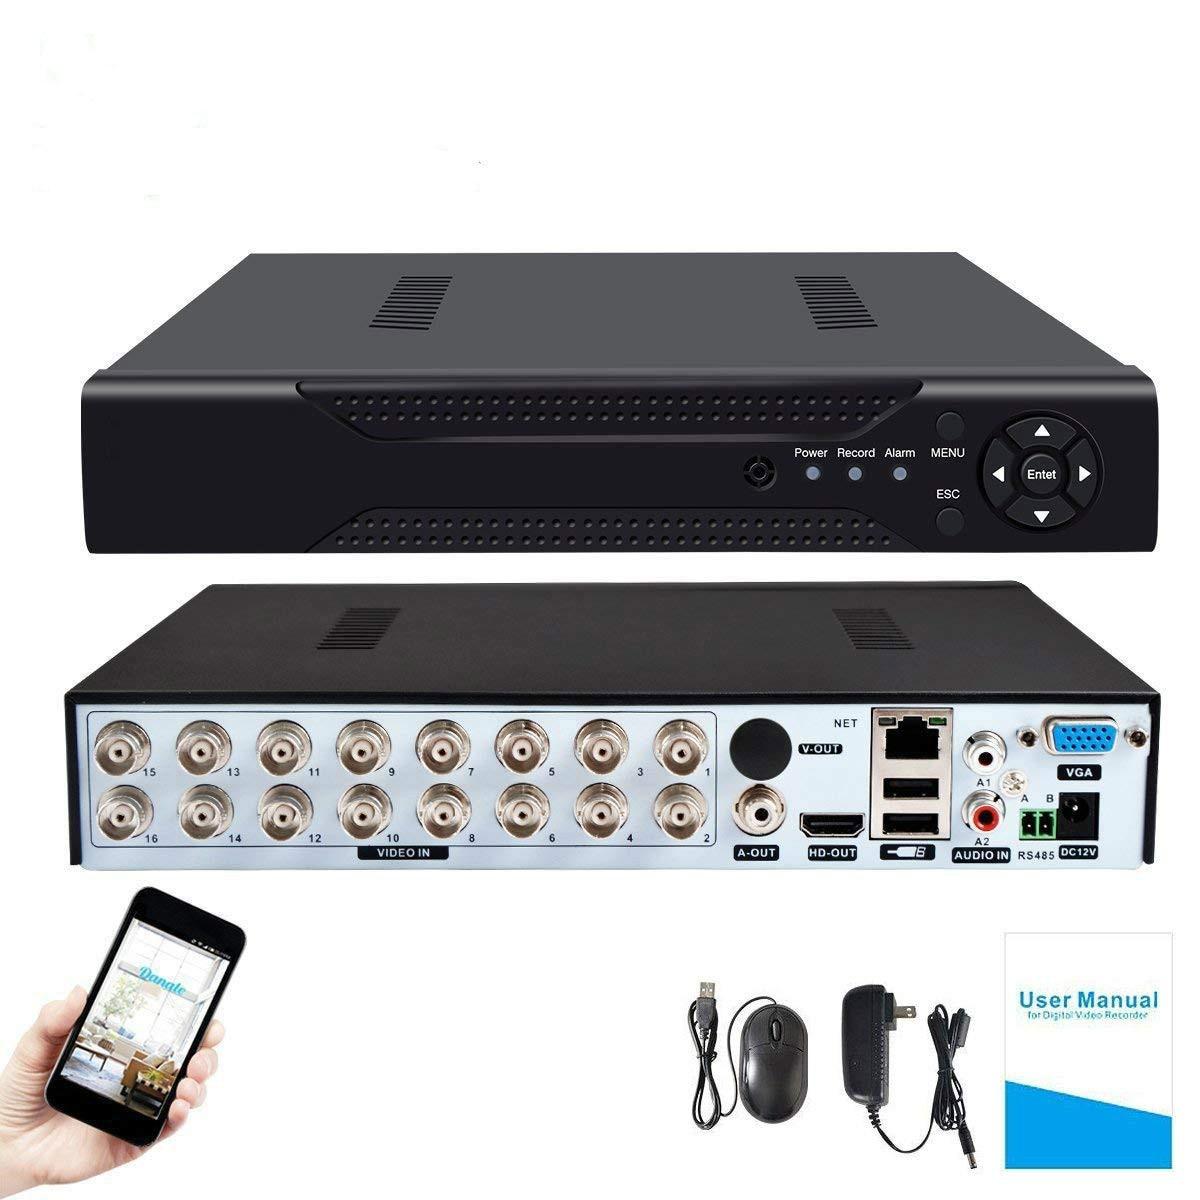 4CH /8CH /16CH AHD Security CCTV DVR H.264 5MP/4MP AHD CVI TVI Analog IP Camera5 5MP 4.0MP Hybrid Video Recorder 4K Video Output